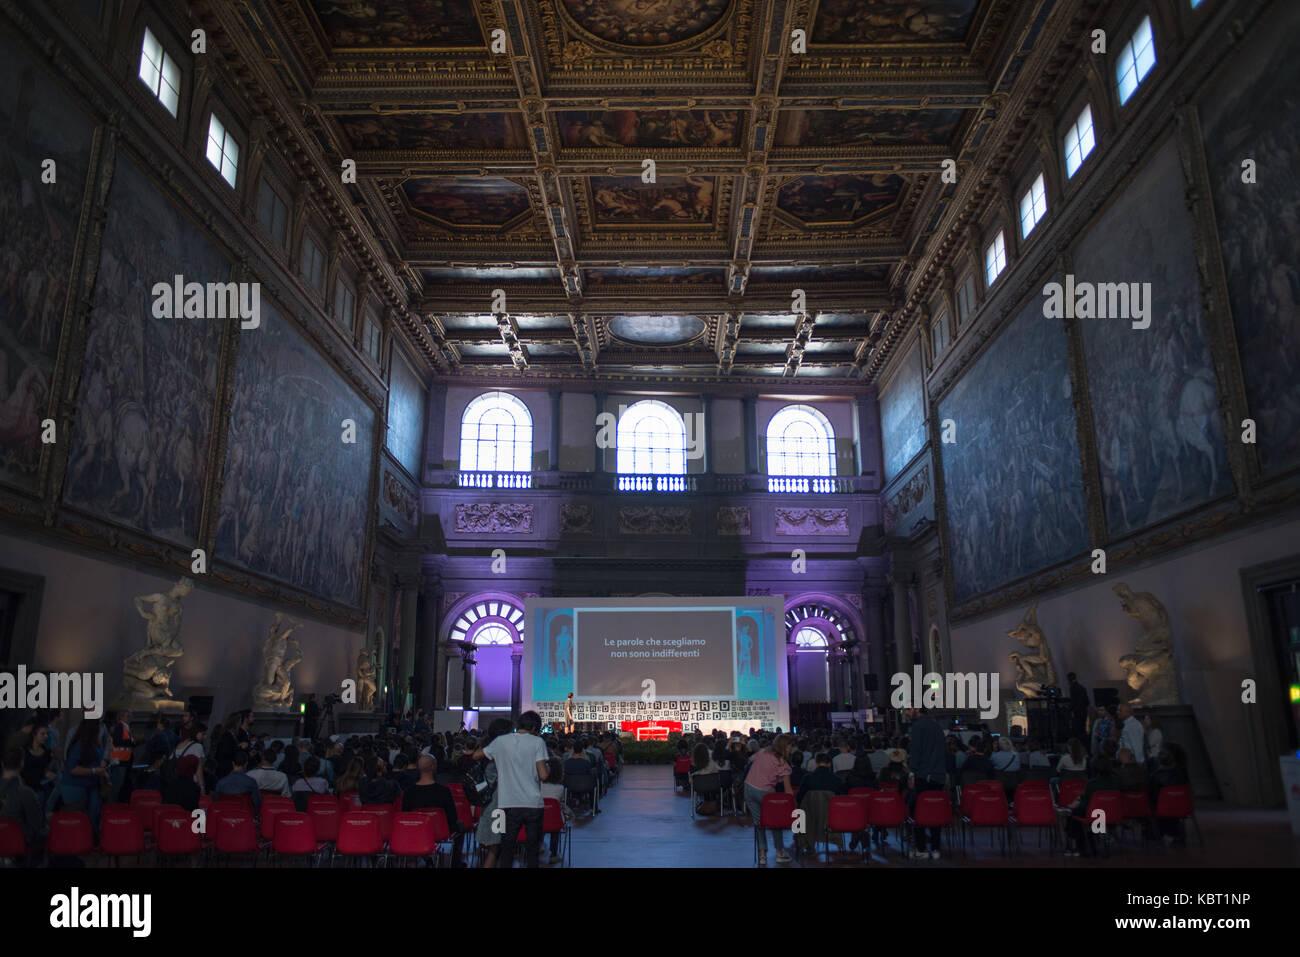 Salone Dei Cinquecento Stockfotos & Salone Dei Cinquecento Bilder ...